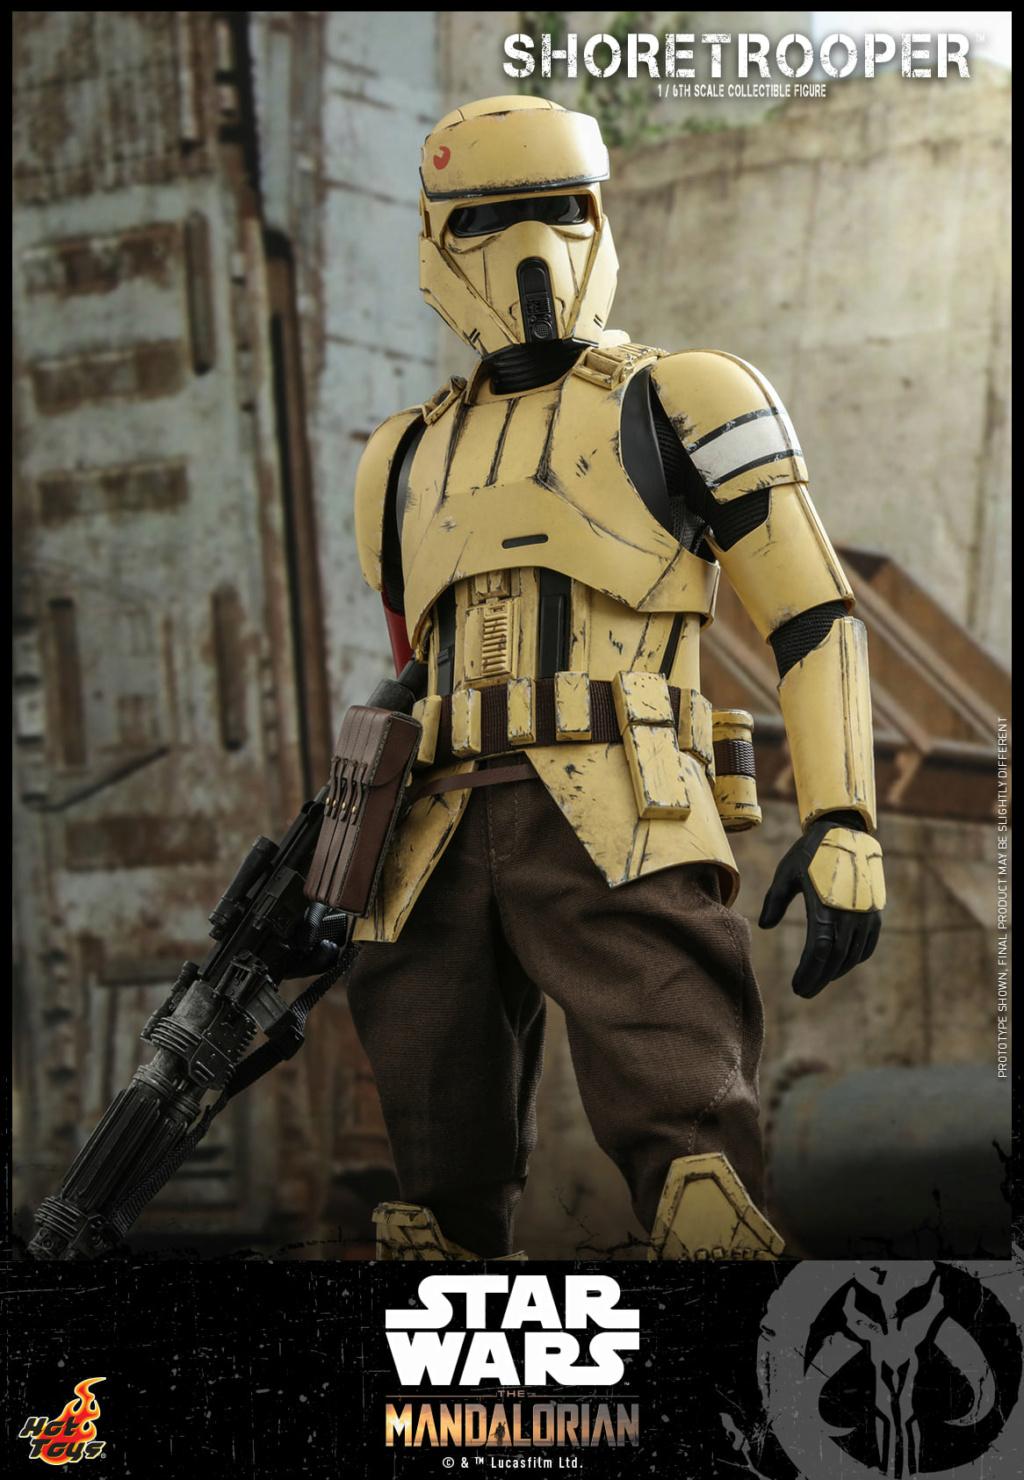 Shoretrooper 1/6 Collectible Figure The Mandalorian Hot Toys Shoret20